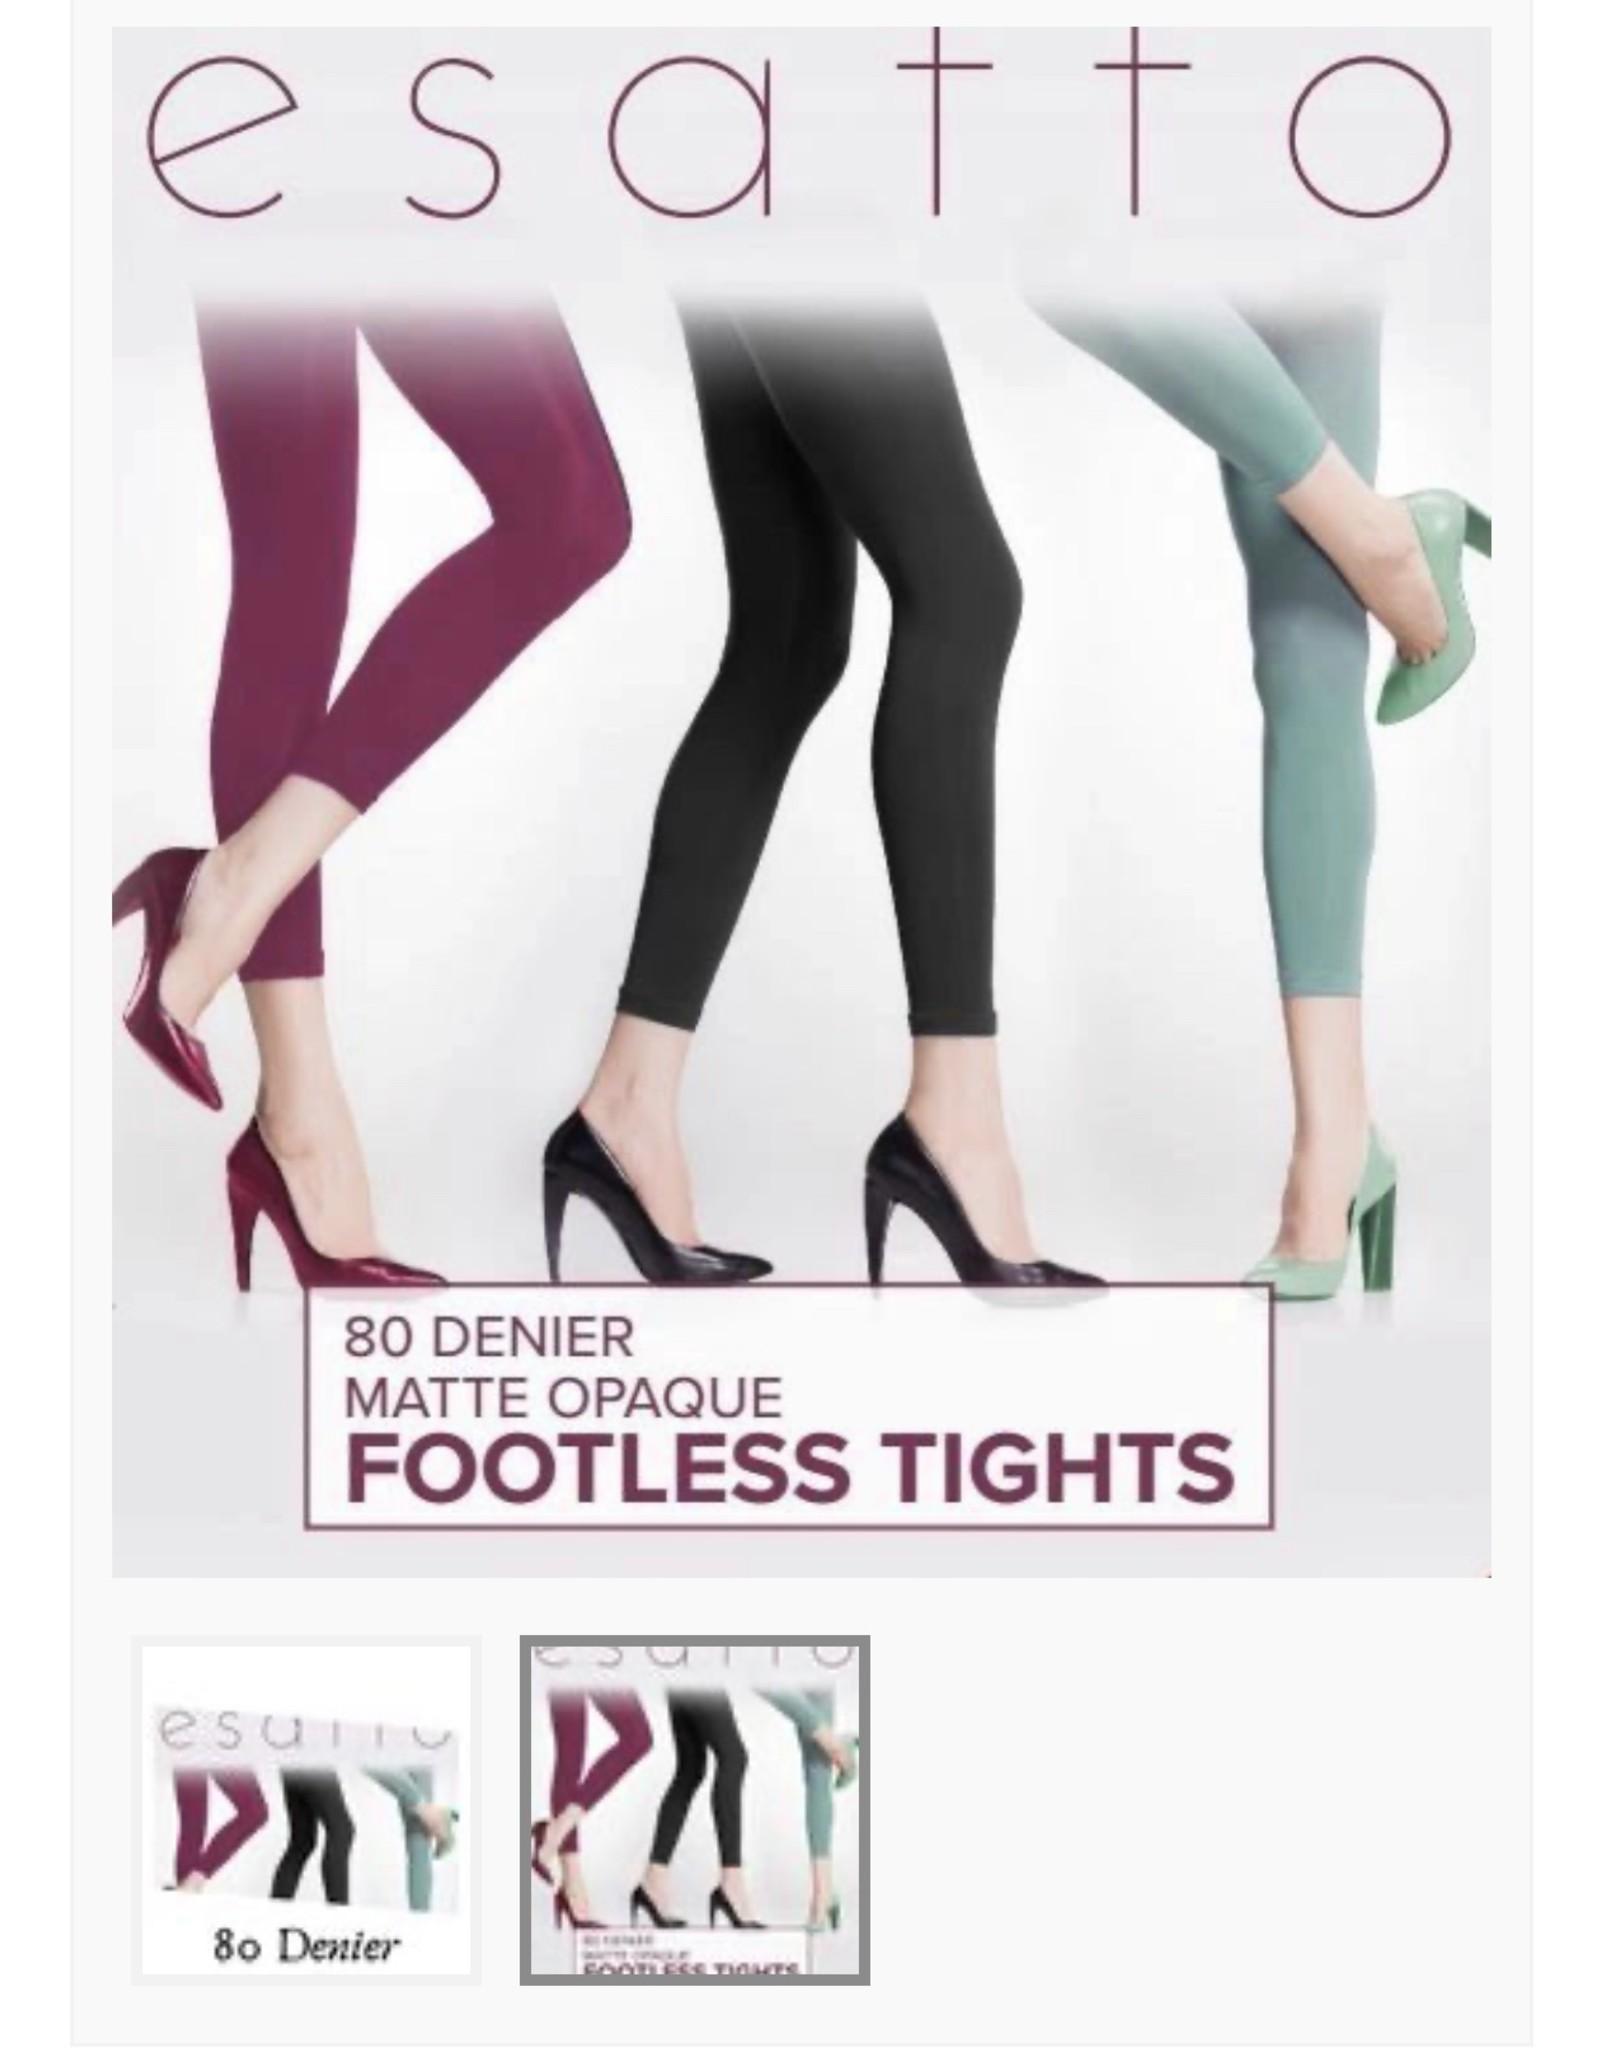 Esatto Esatto Women's 80 Denier Control Top Footless Tights